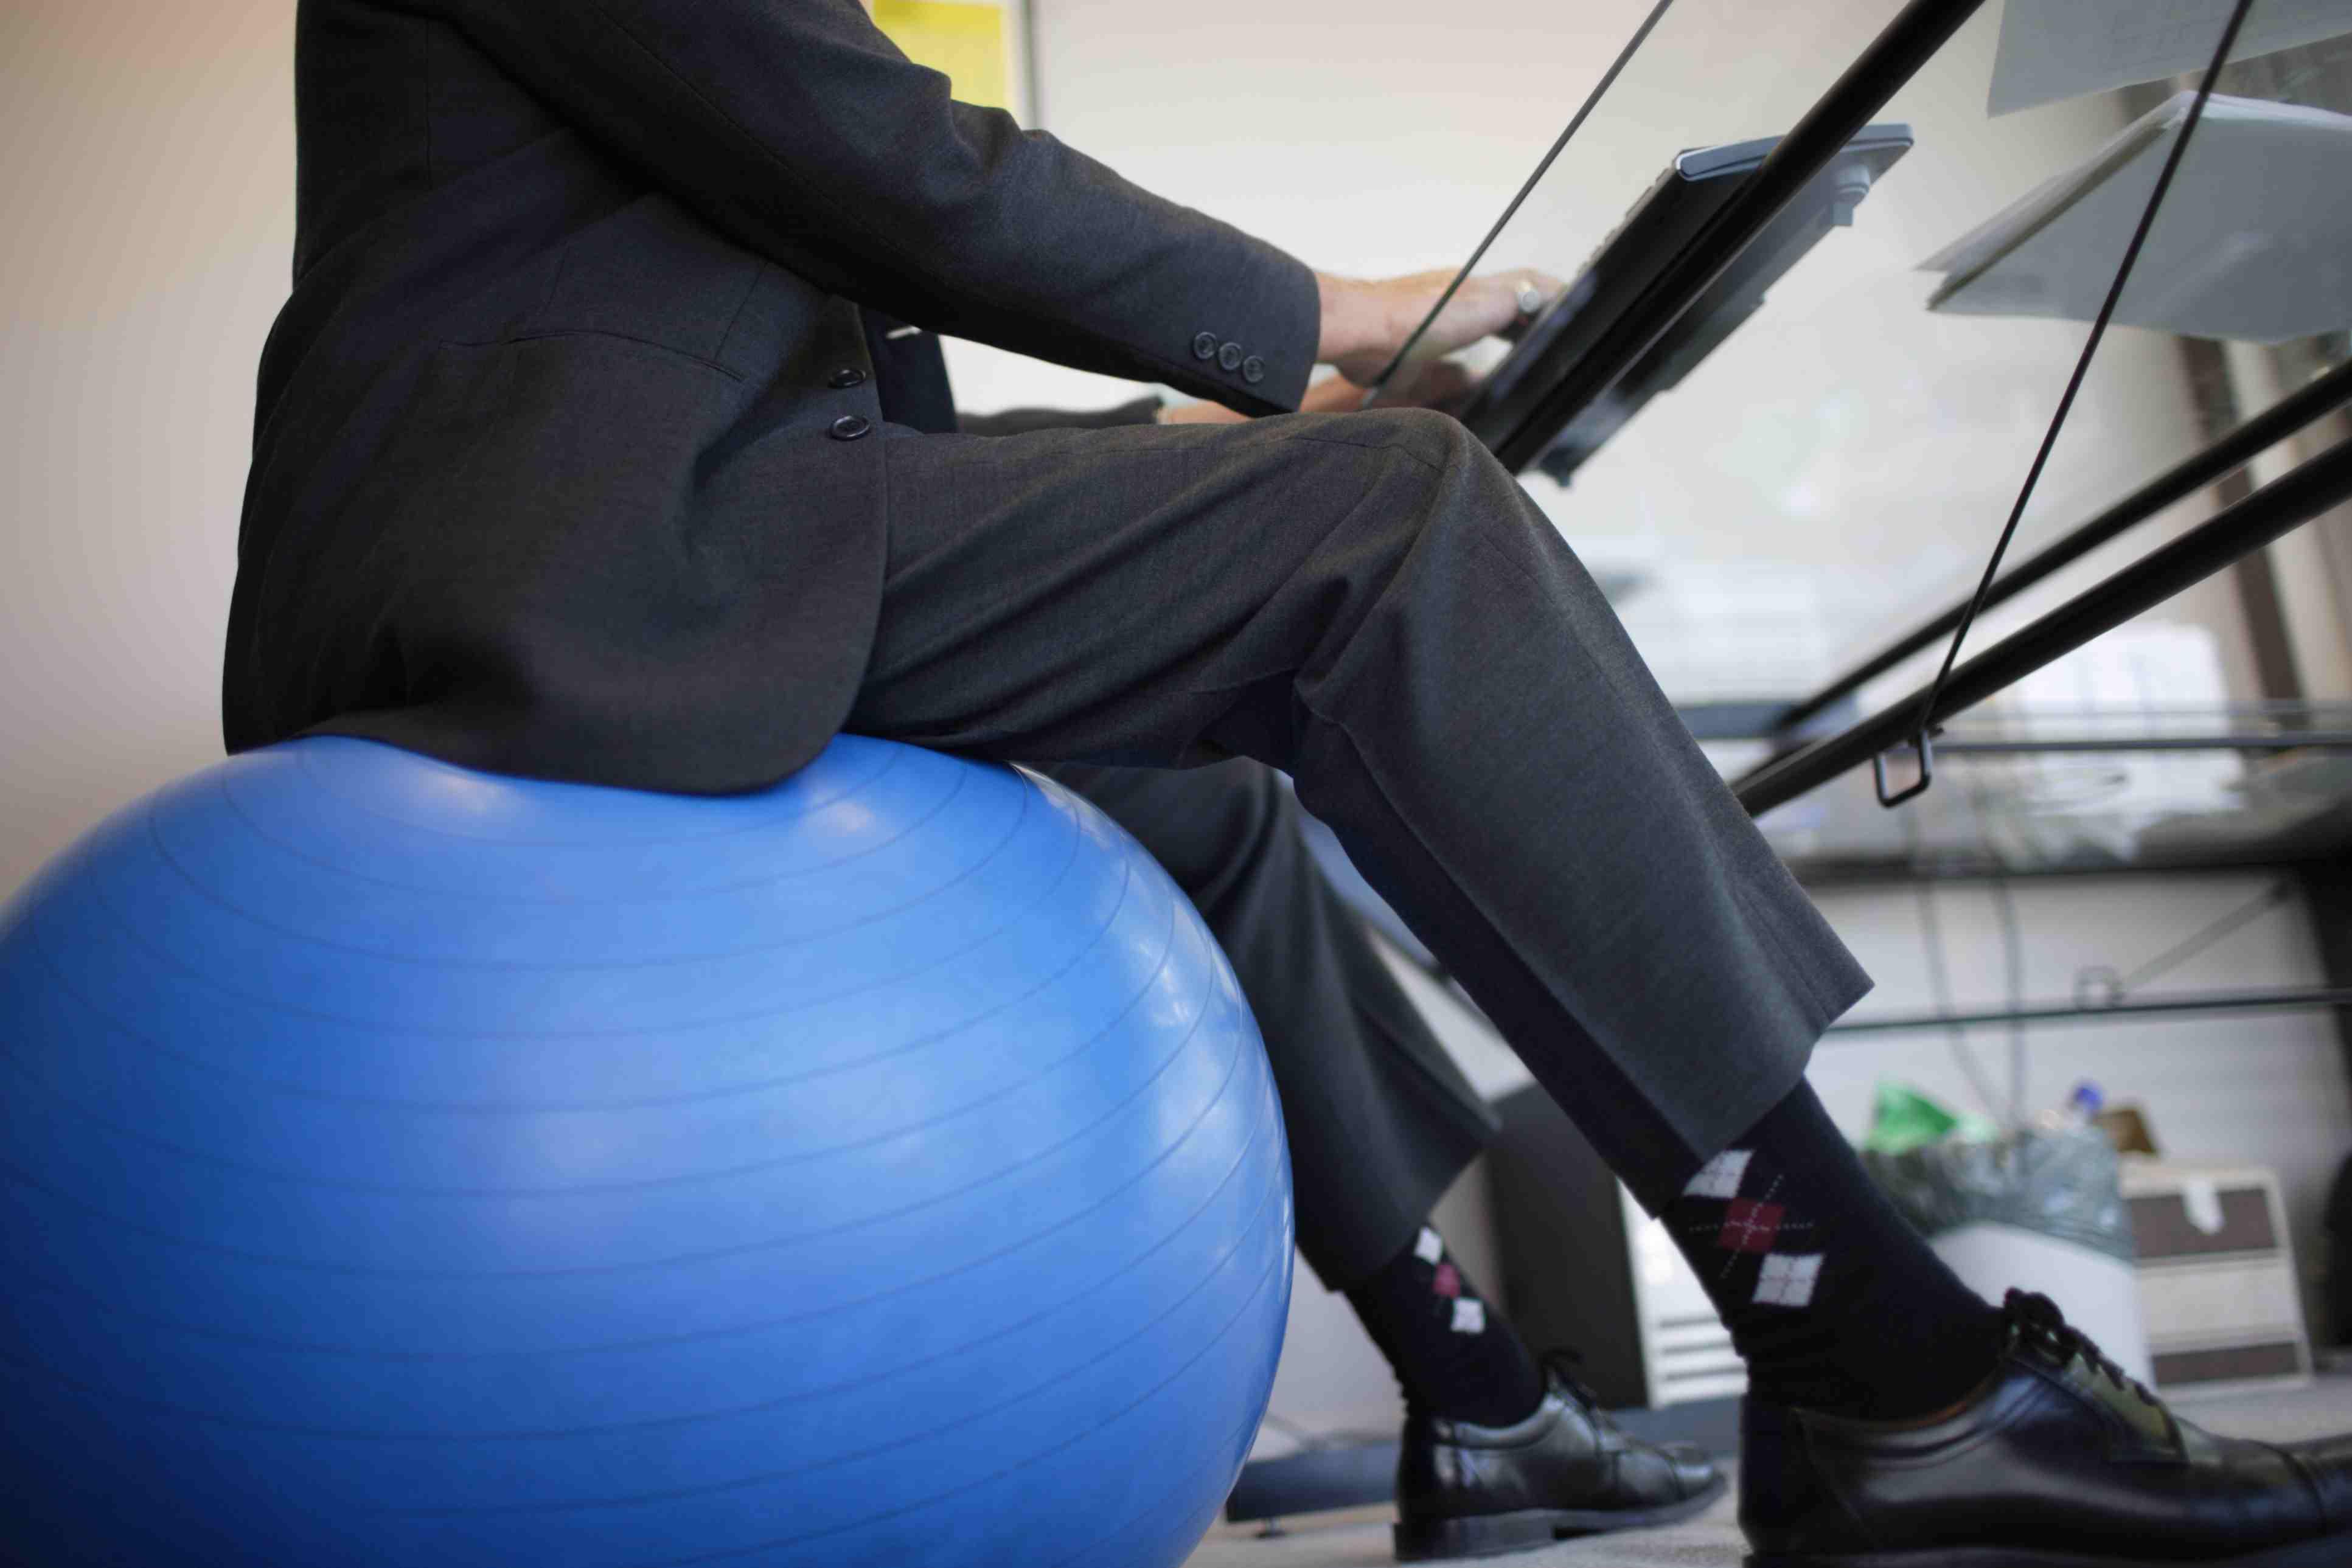 Man Using an Exercise Ball as a Desk Chair